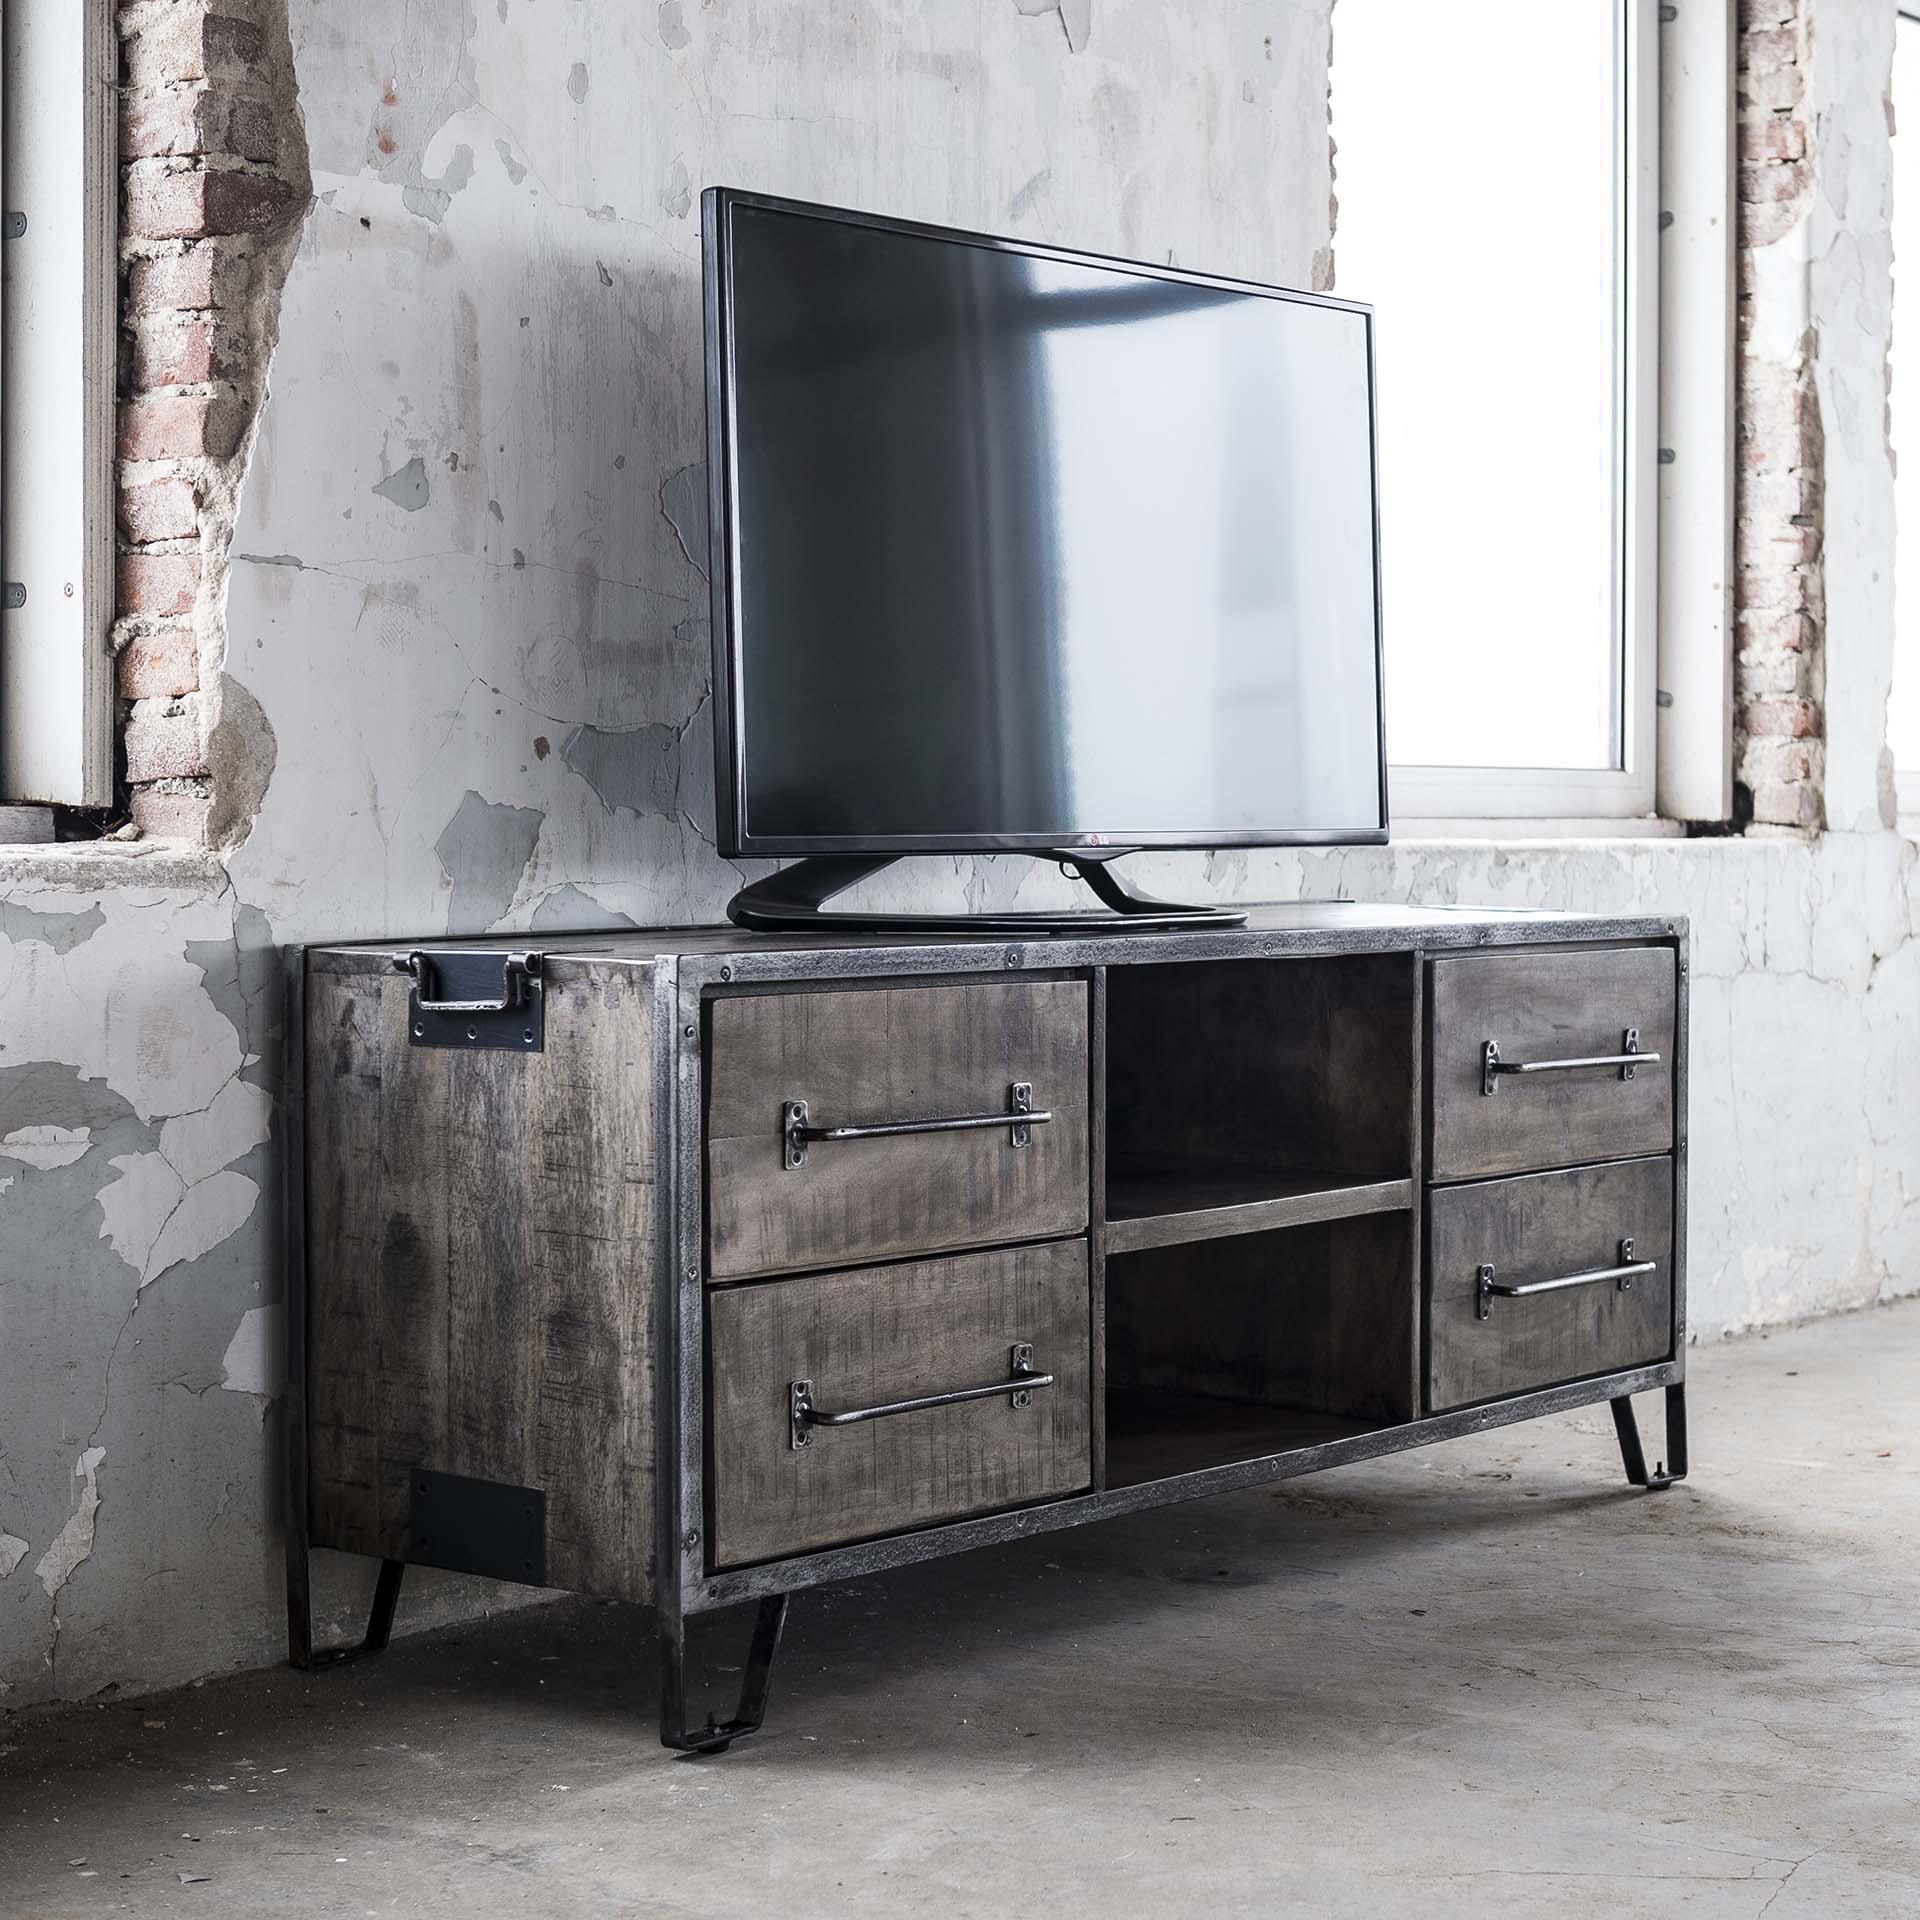 meuble tv industriel bois gris 4 tiroirs poignees roadies